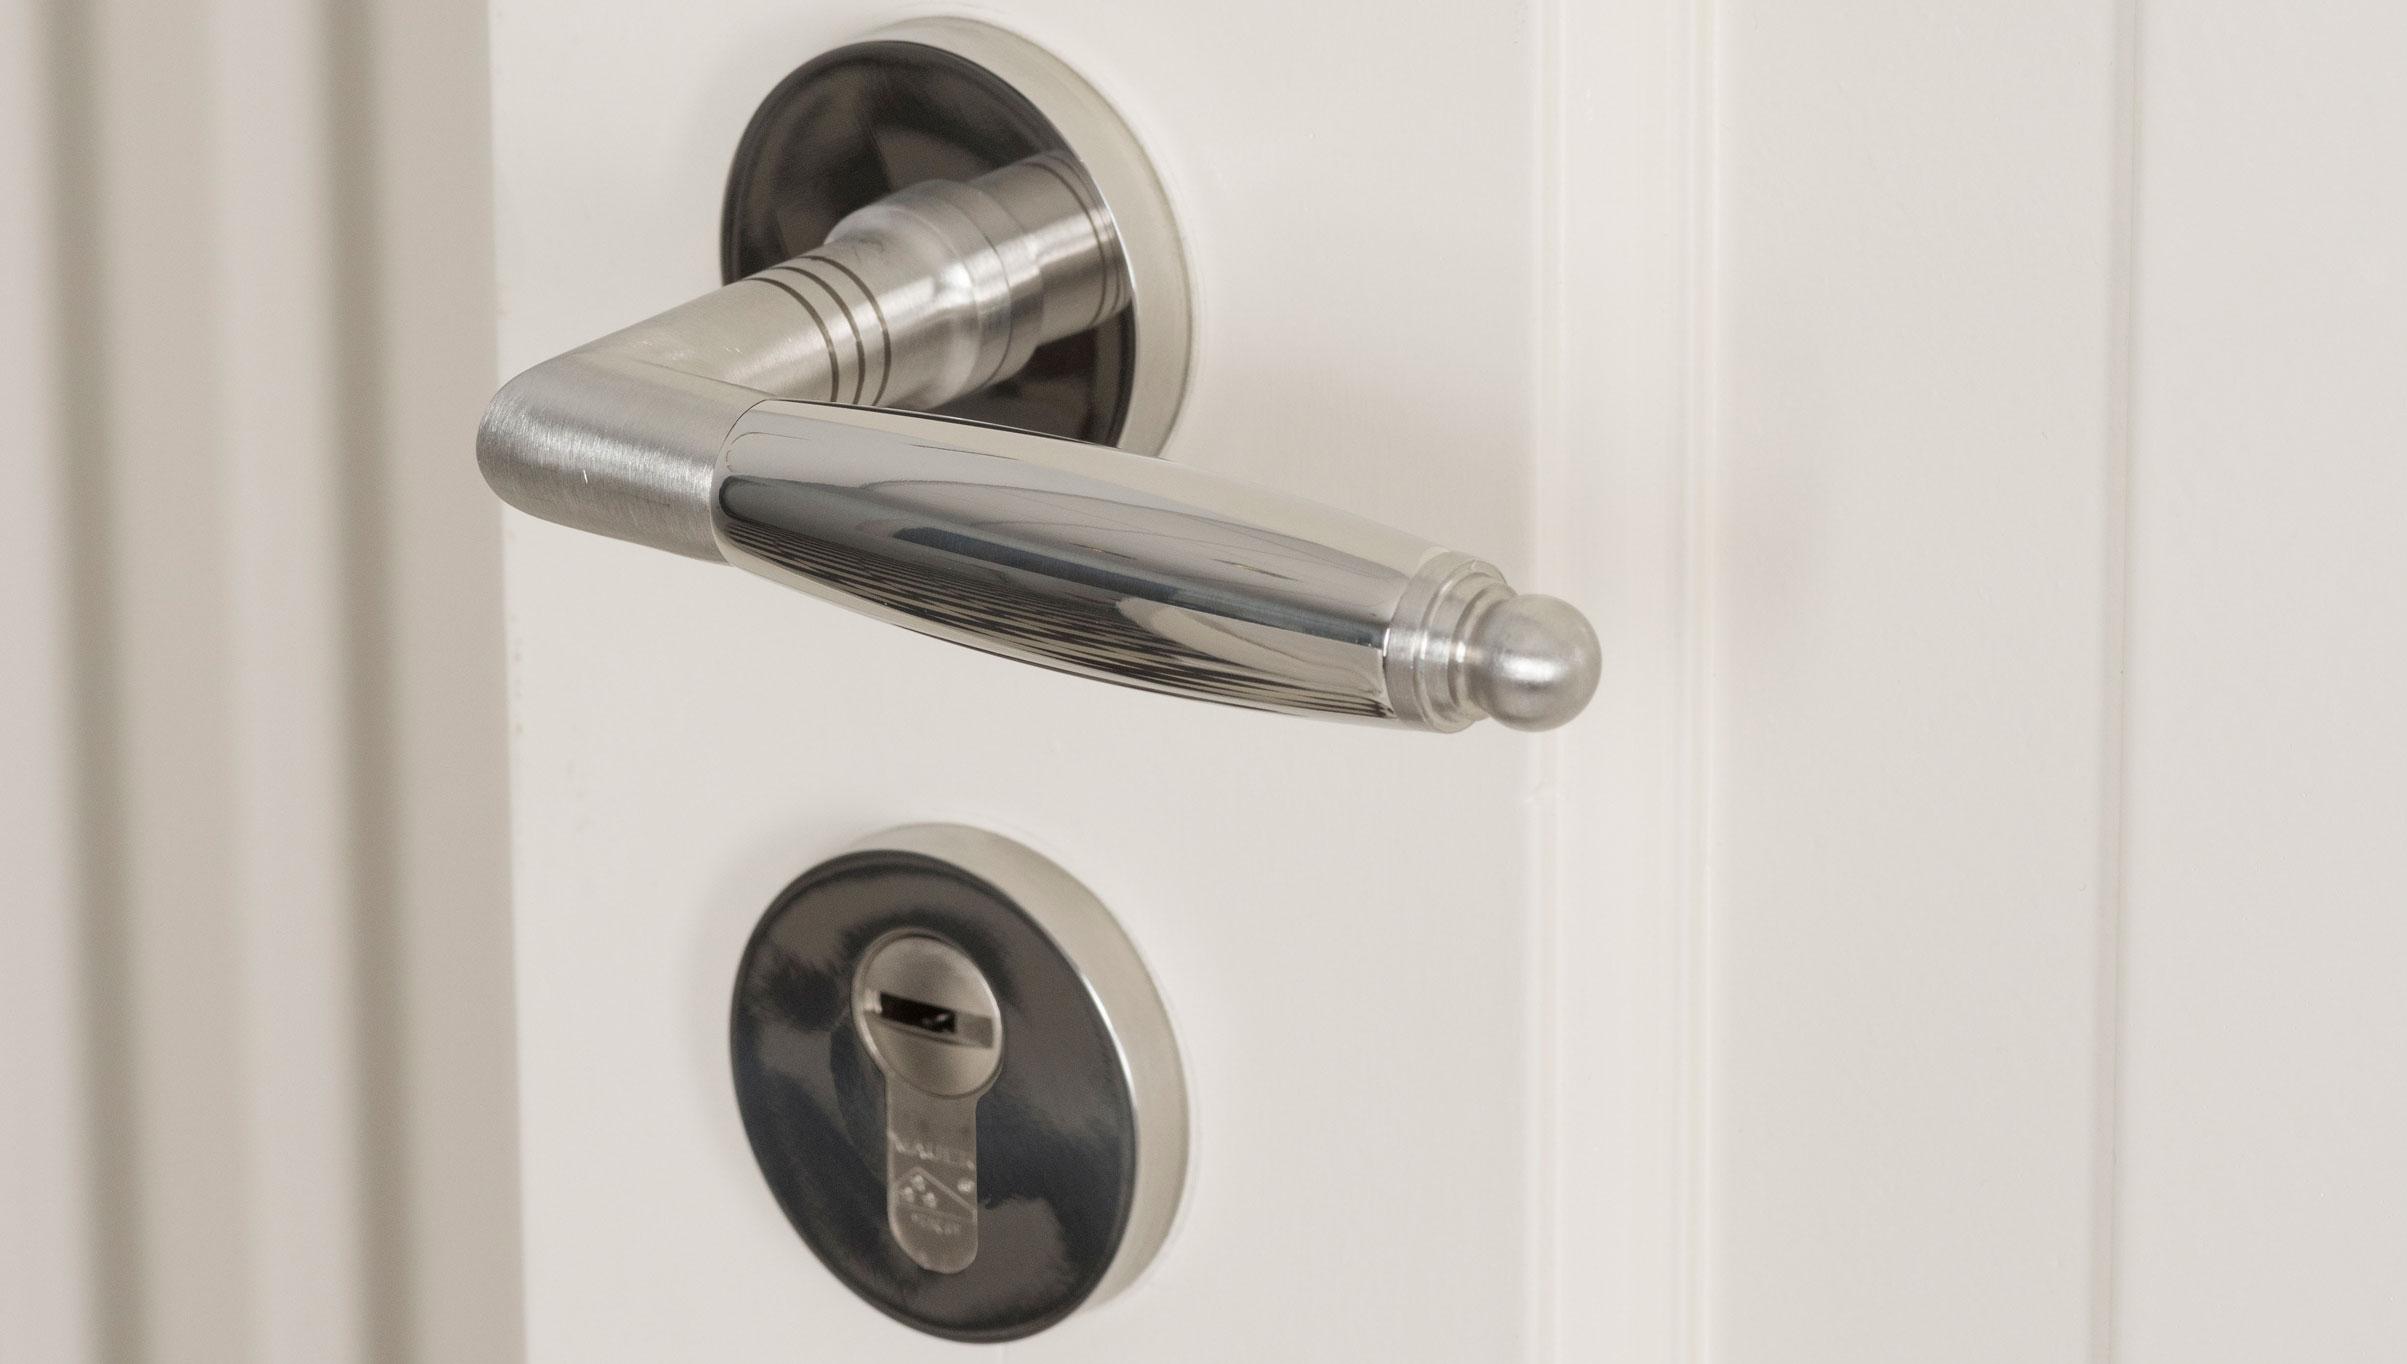 Sfeerimpressie GPF4148 Ika deurkruk op rozet.jpg